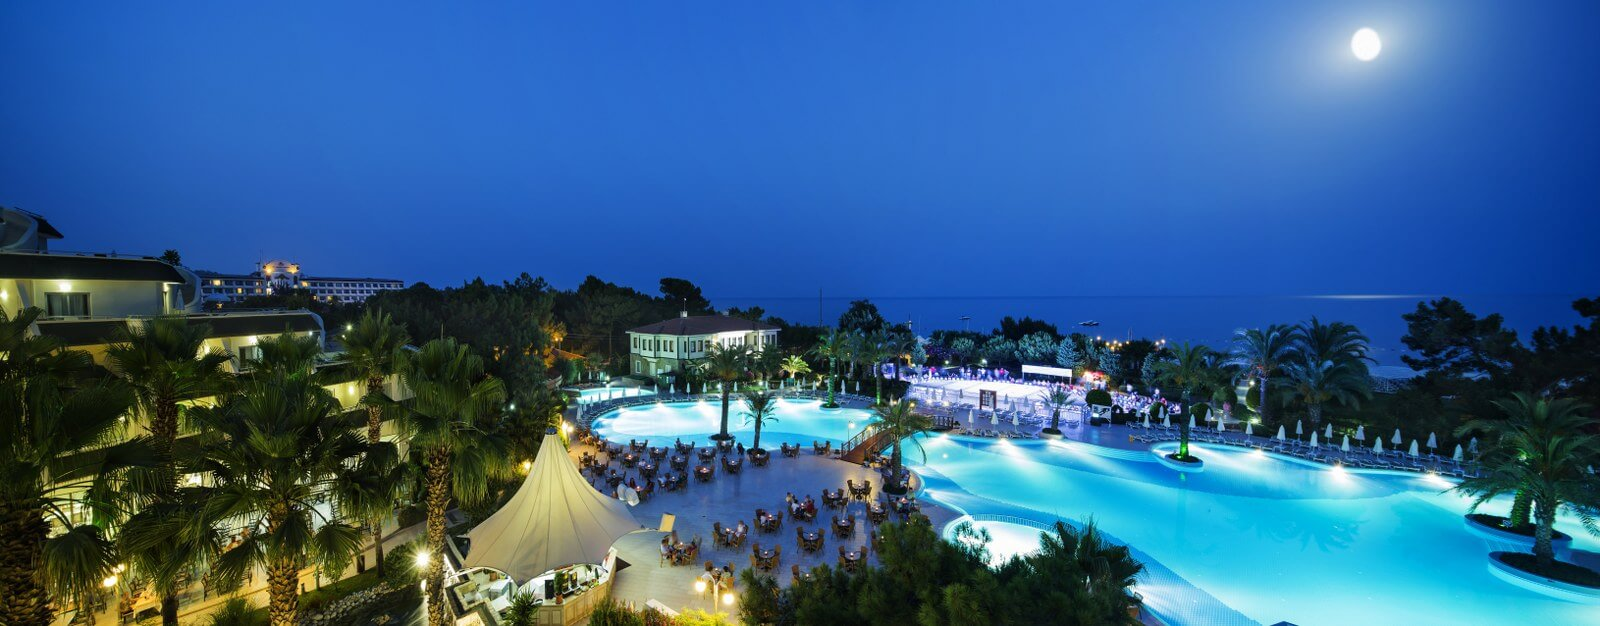 Queen's Park Tekirova Resort & Spa Hotel